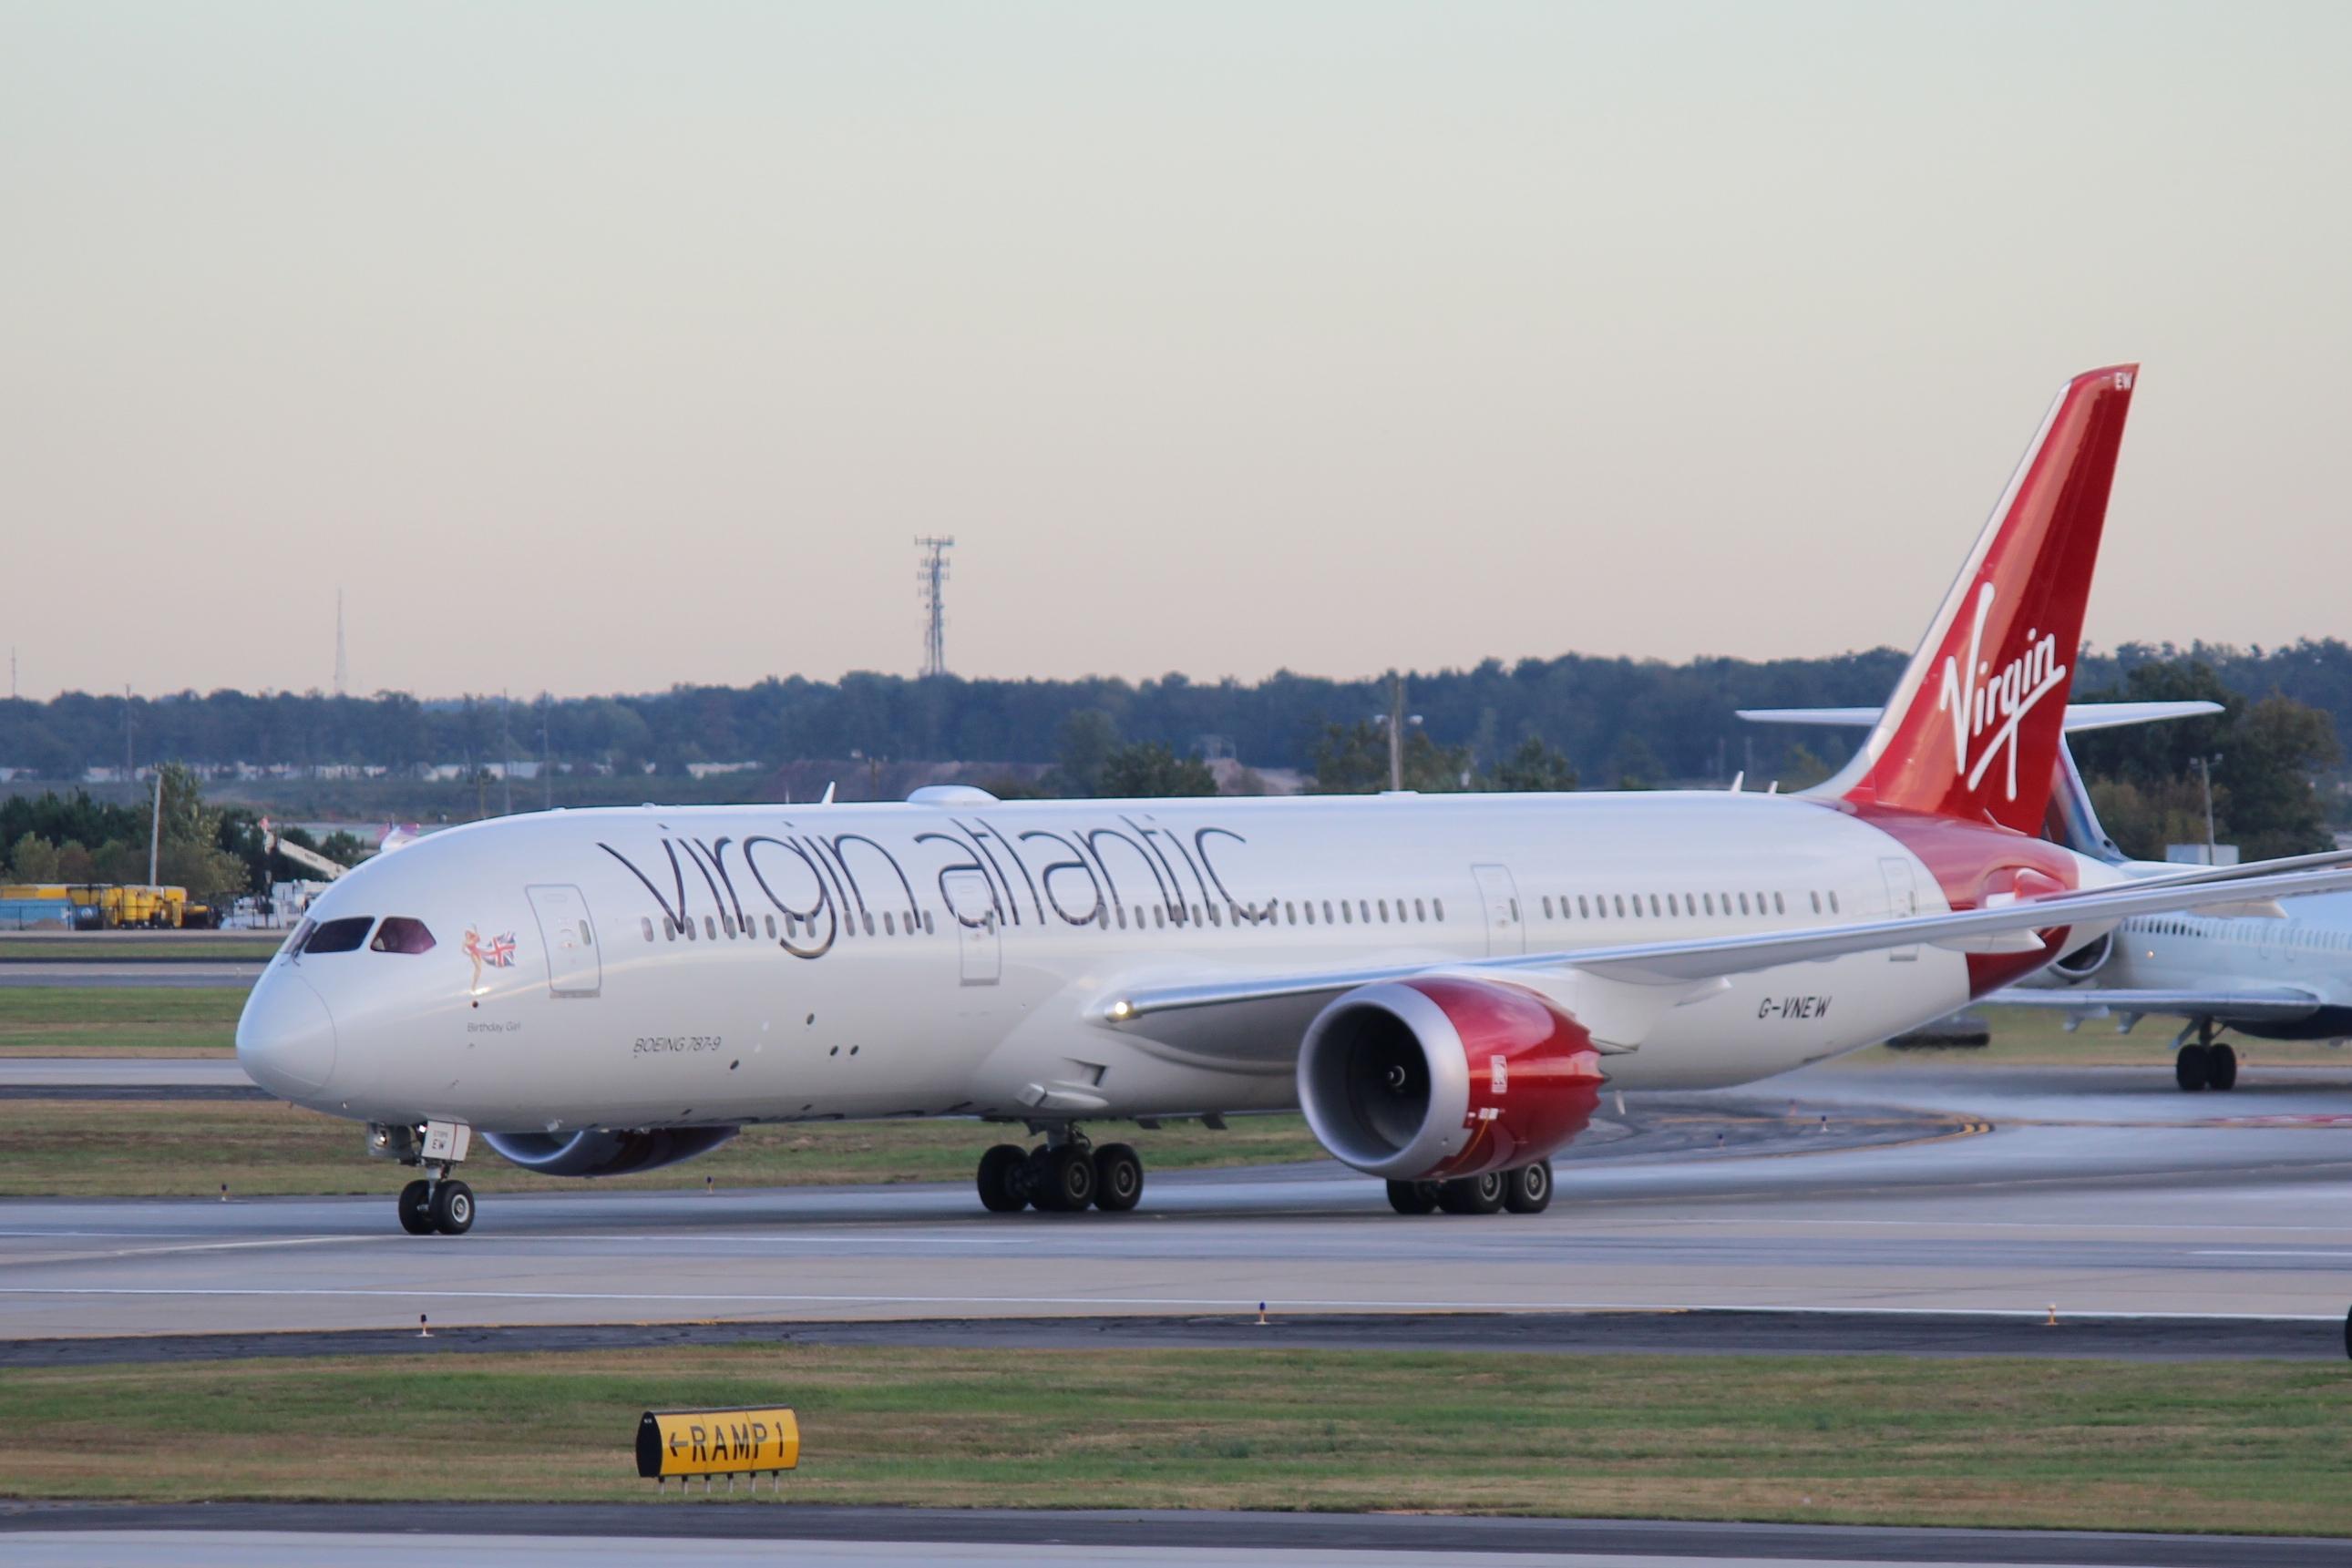 Air France, KLM and Virgin Atlantic launch extensive